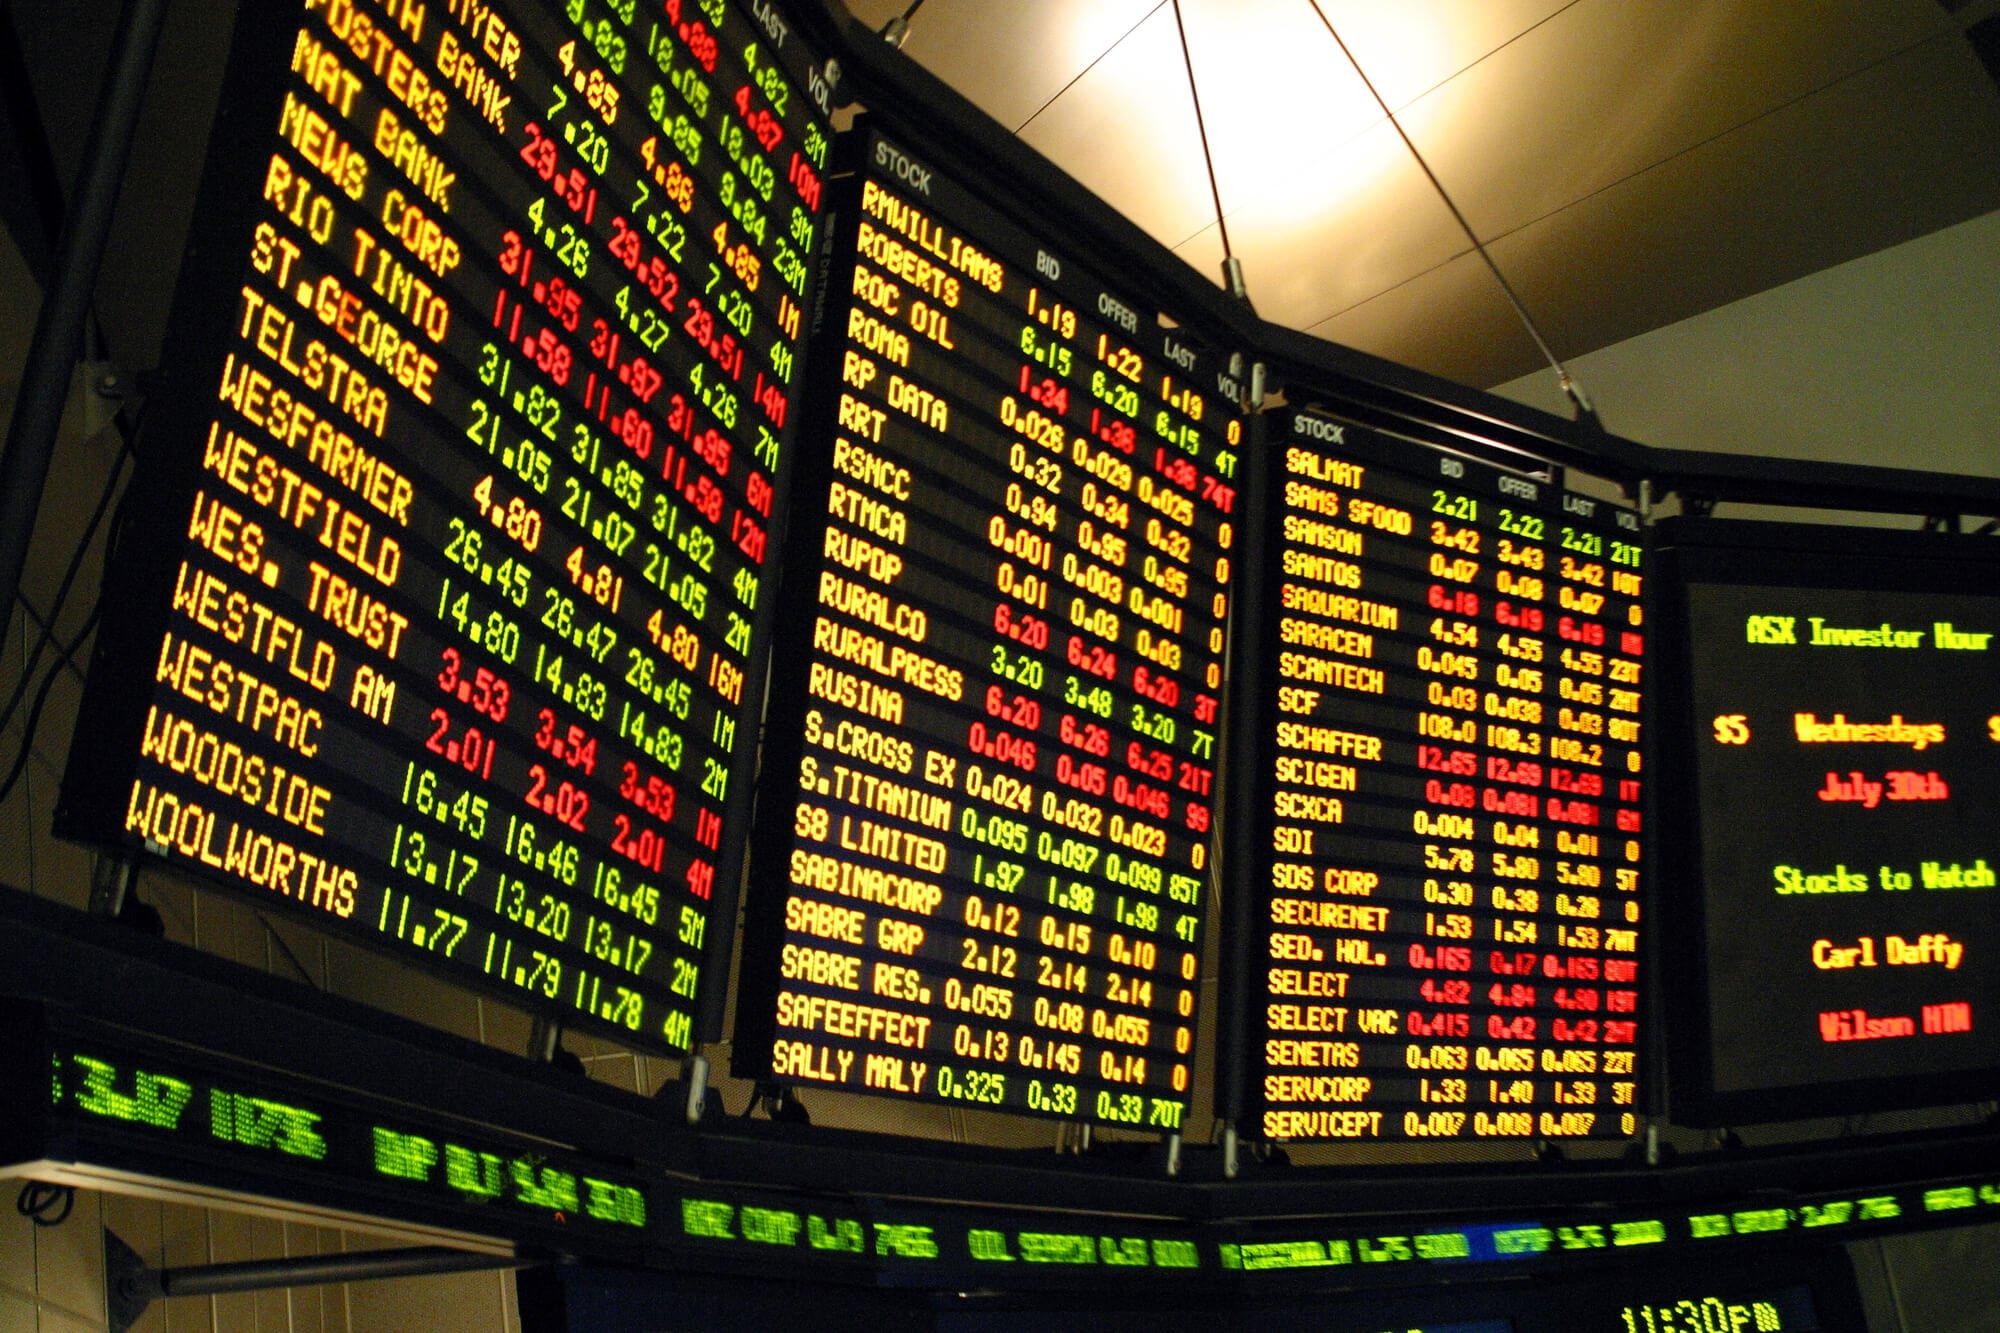 stocks investment advisor in Palm Beach